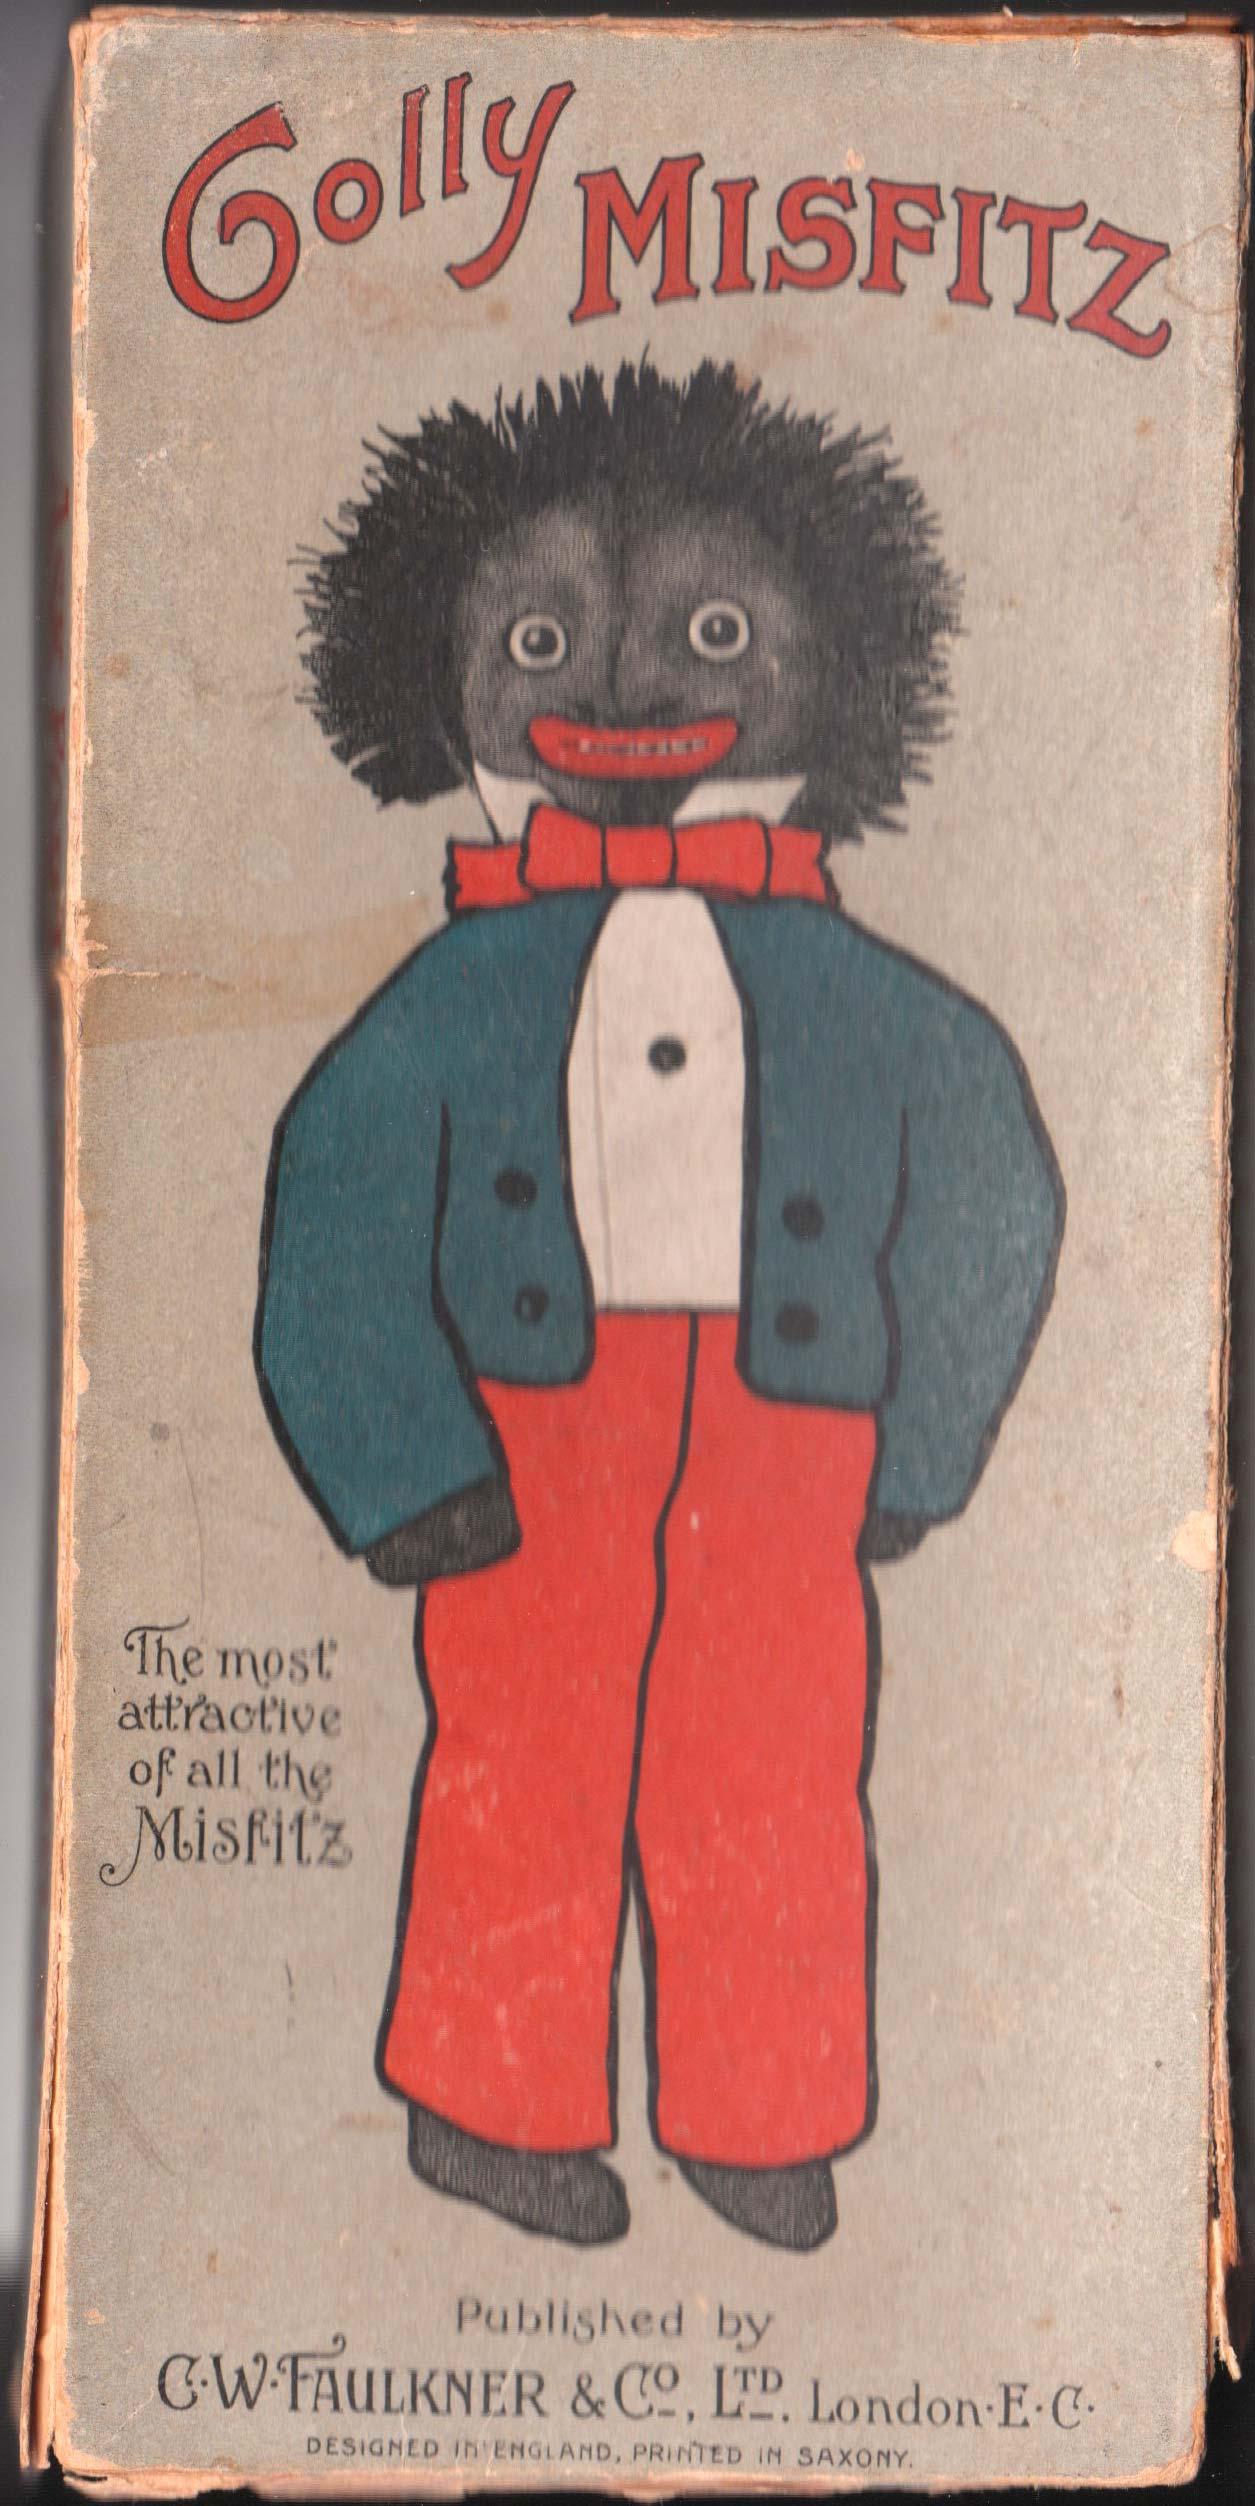 Box from Golly Misfitz from c.1905-1908